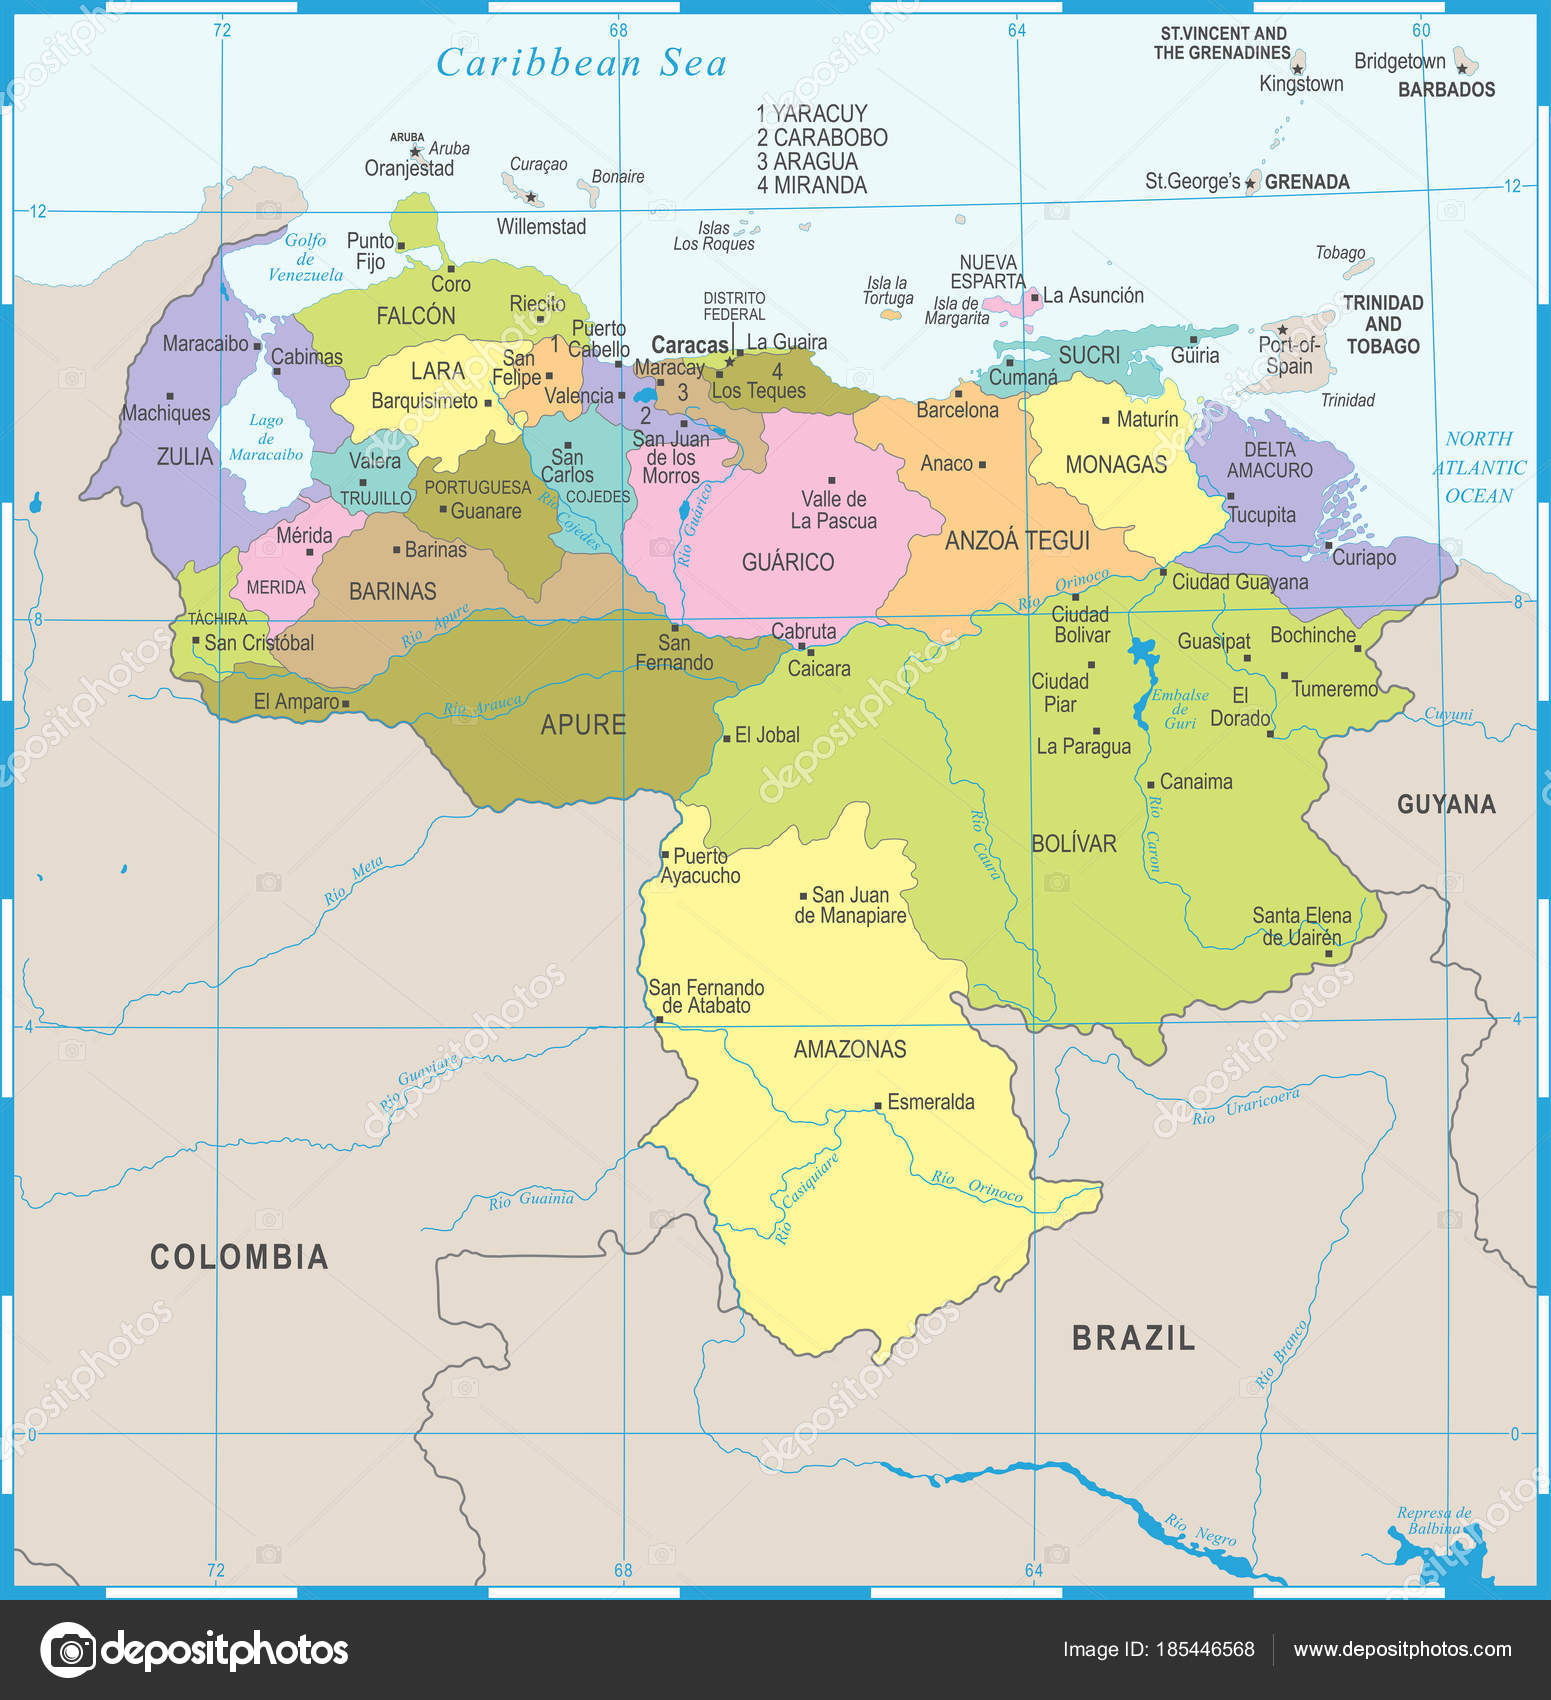 Venezuela map detailed vector illustration stock vector venezuela map detailed vector illustration stock vector sciox Images